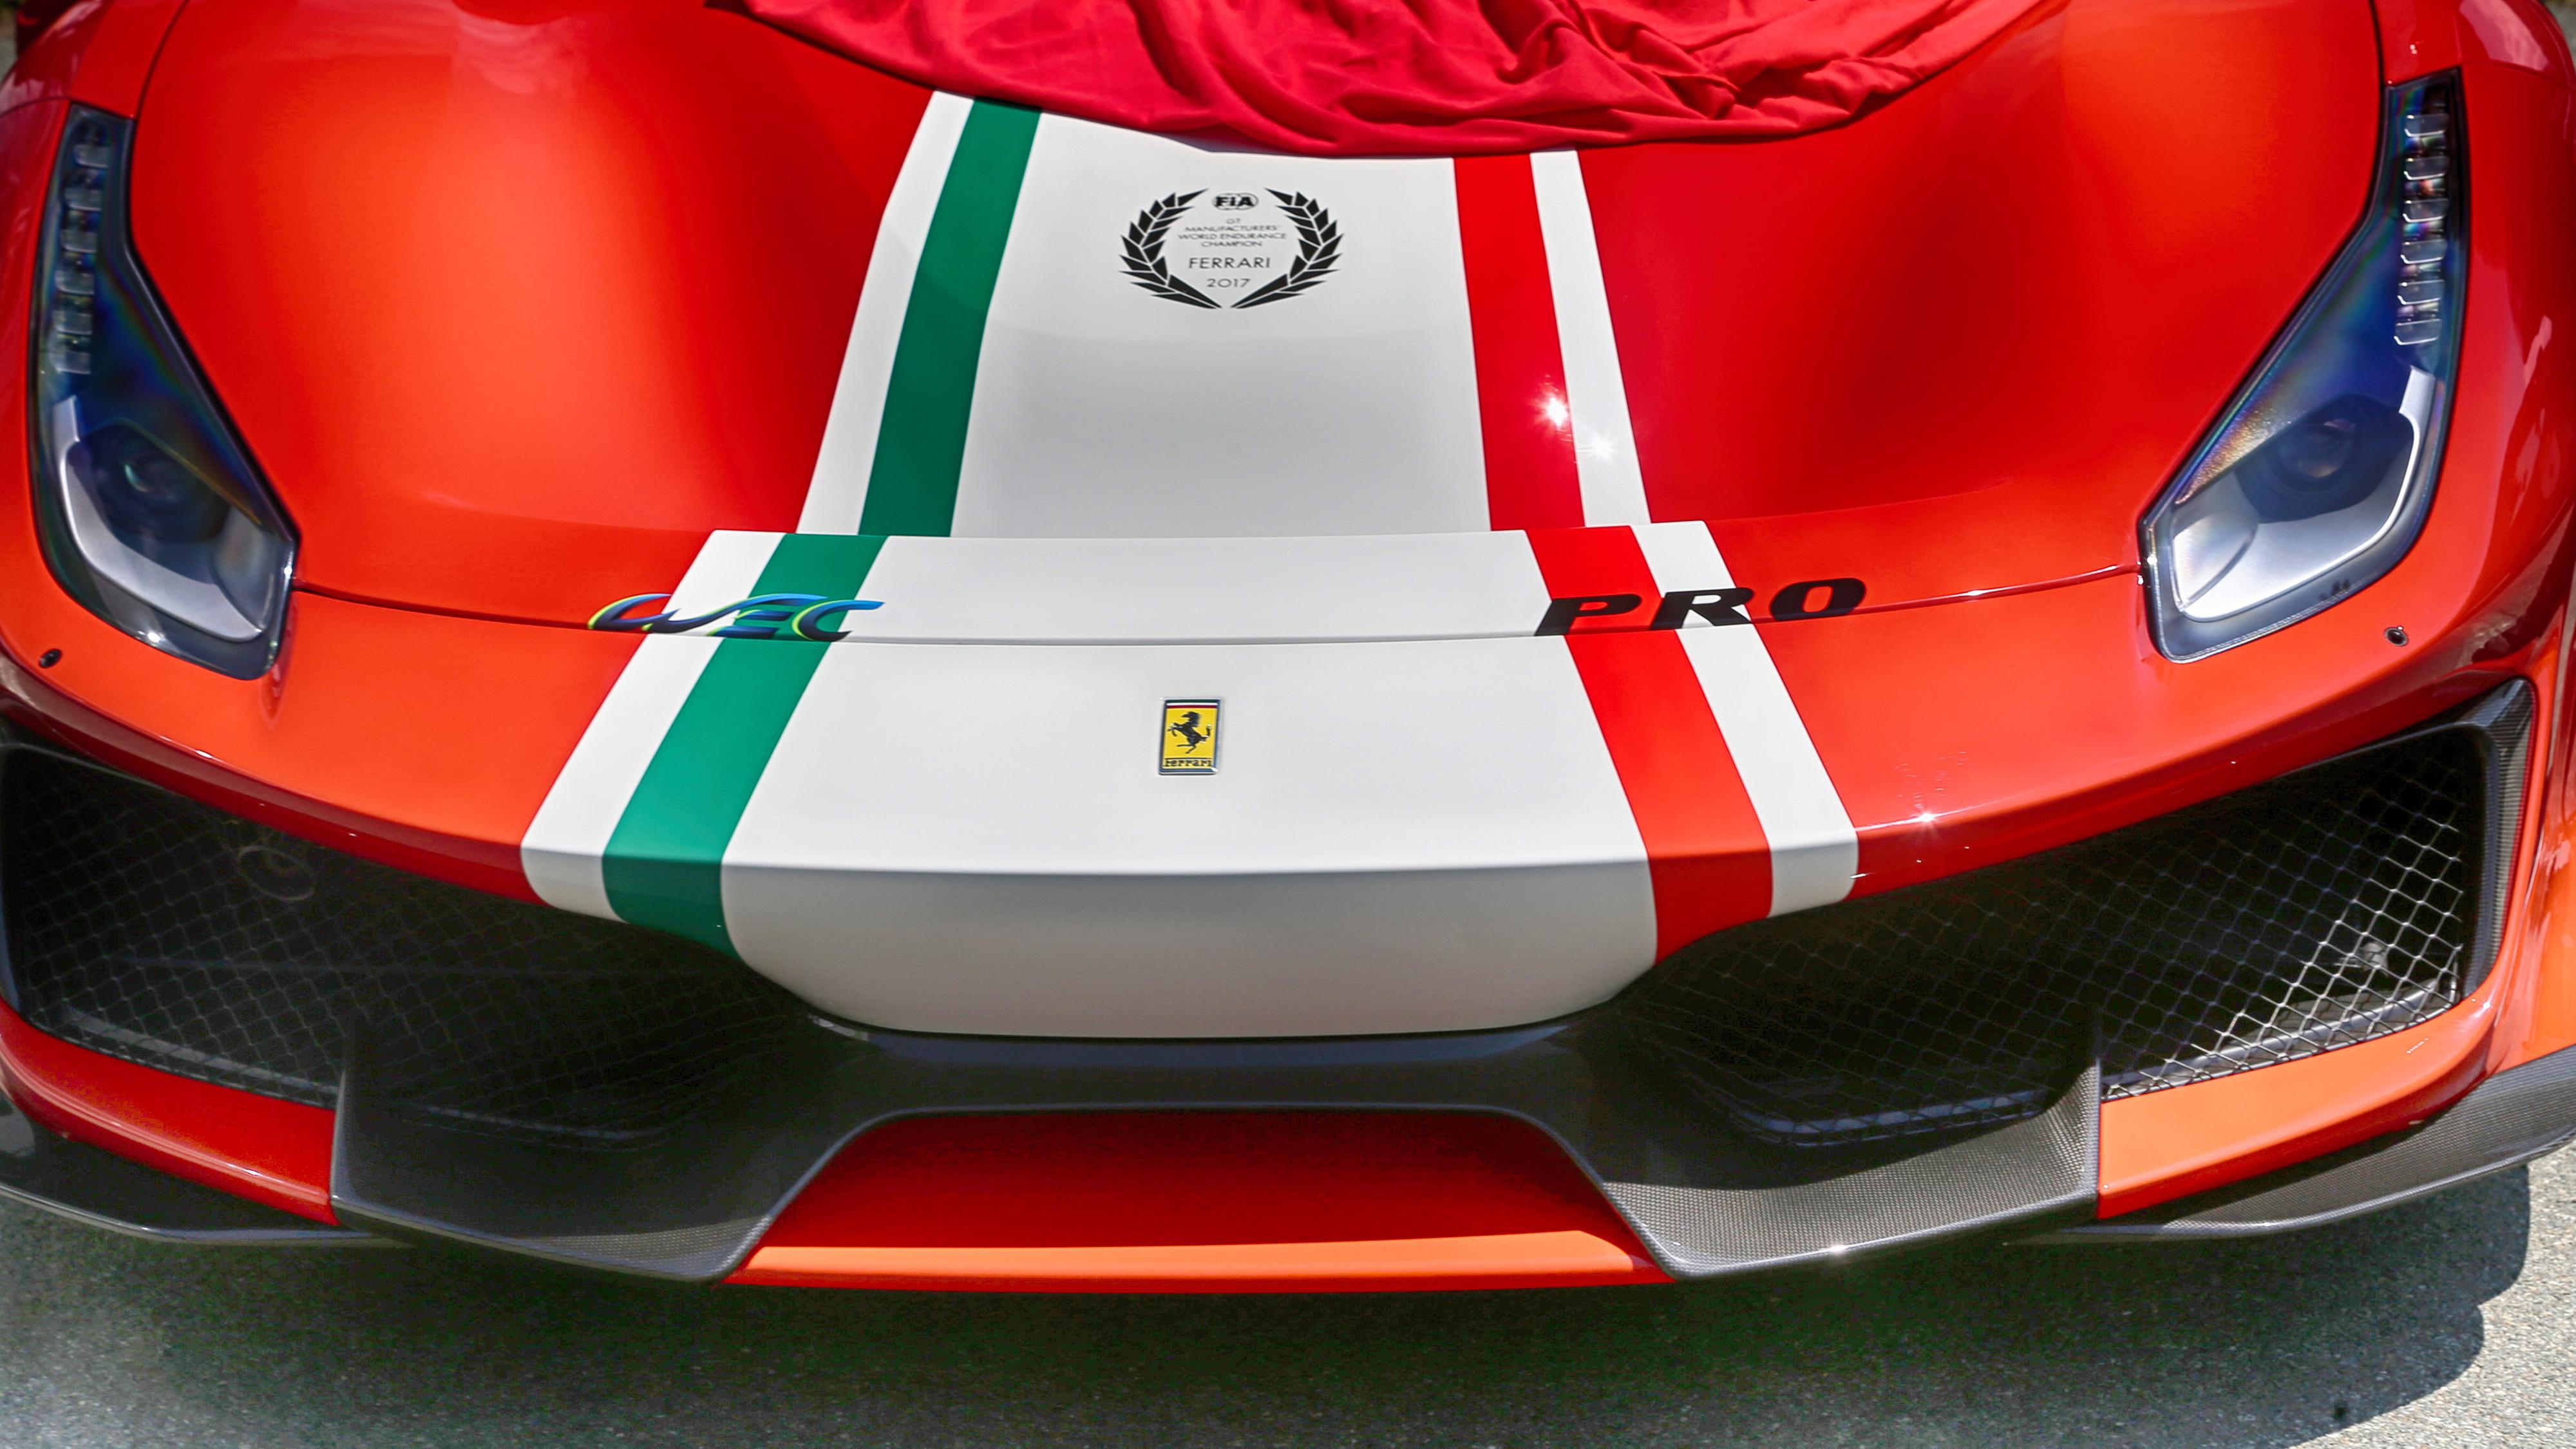 Ferrari 488 Pista Piloti 4000x2250 Wallpaper Teahub Io